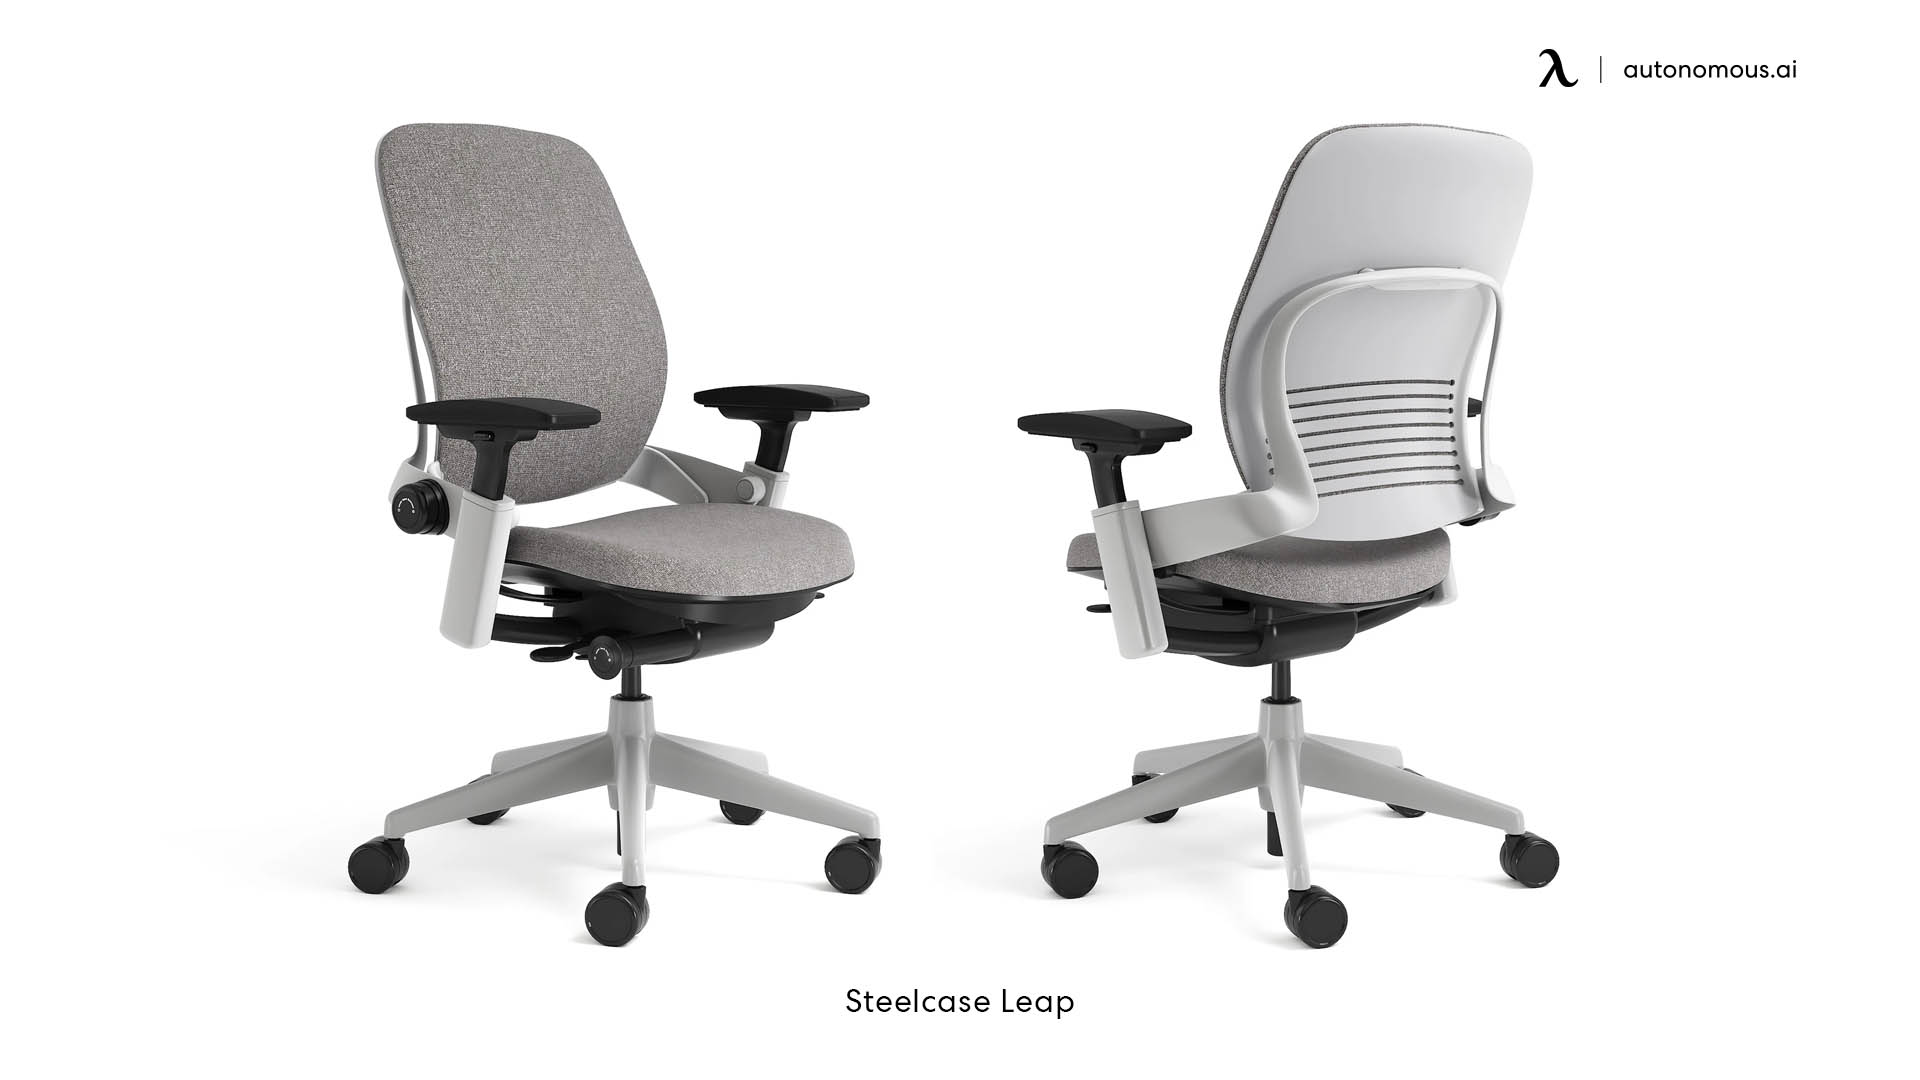 Steelcase Leap Fabric Ergonomic Office Chair